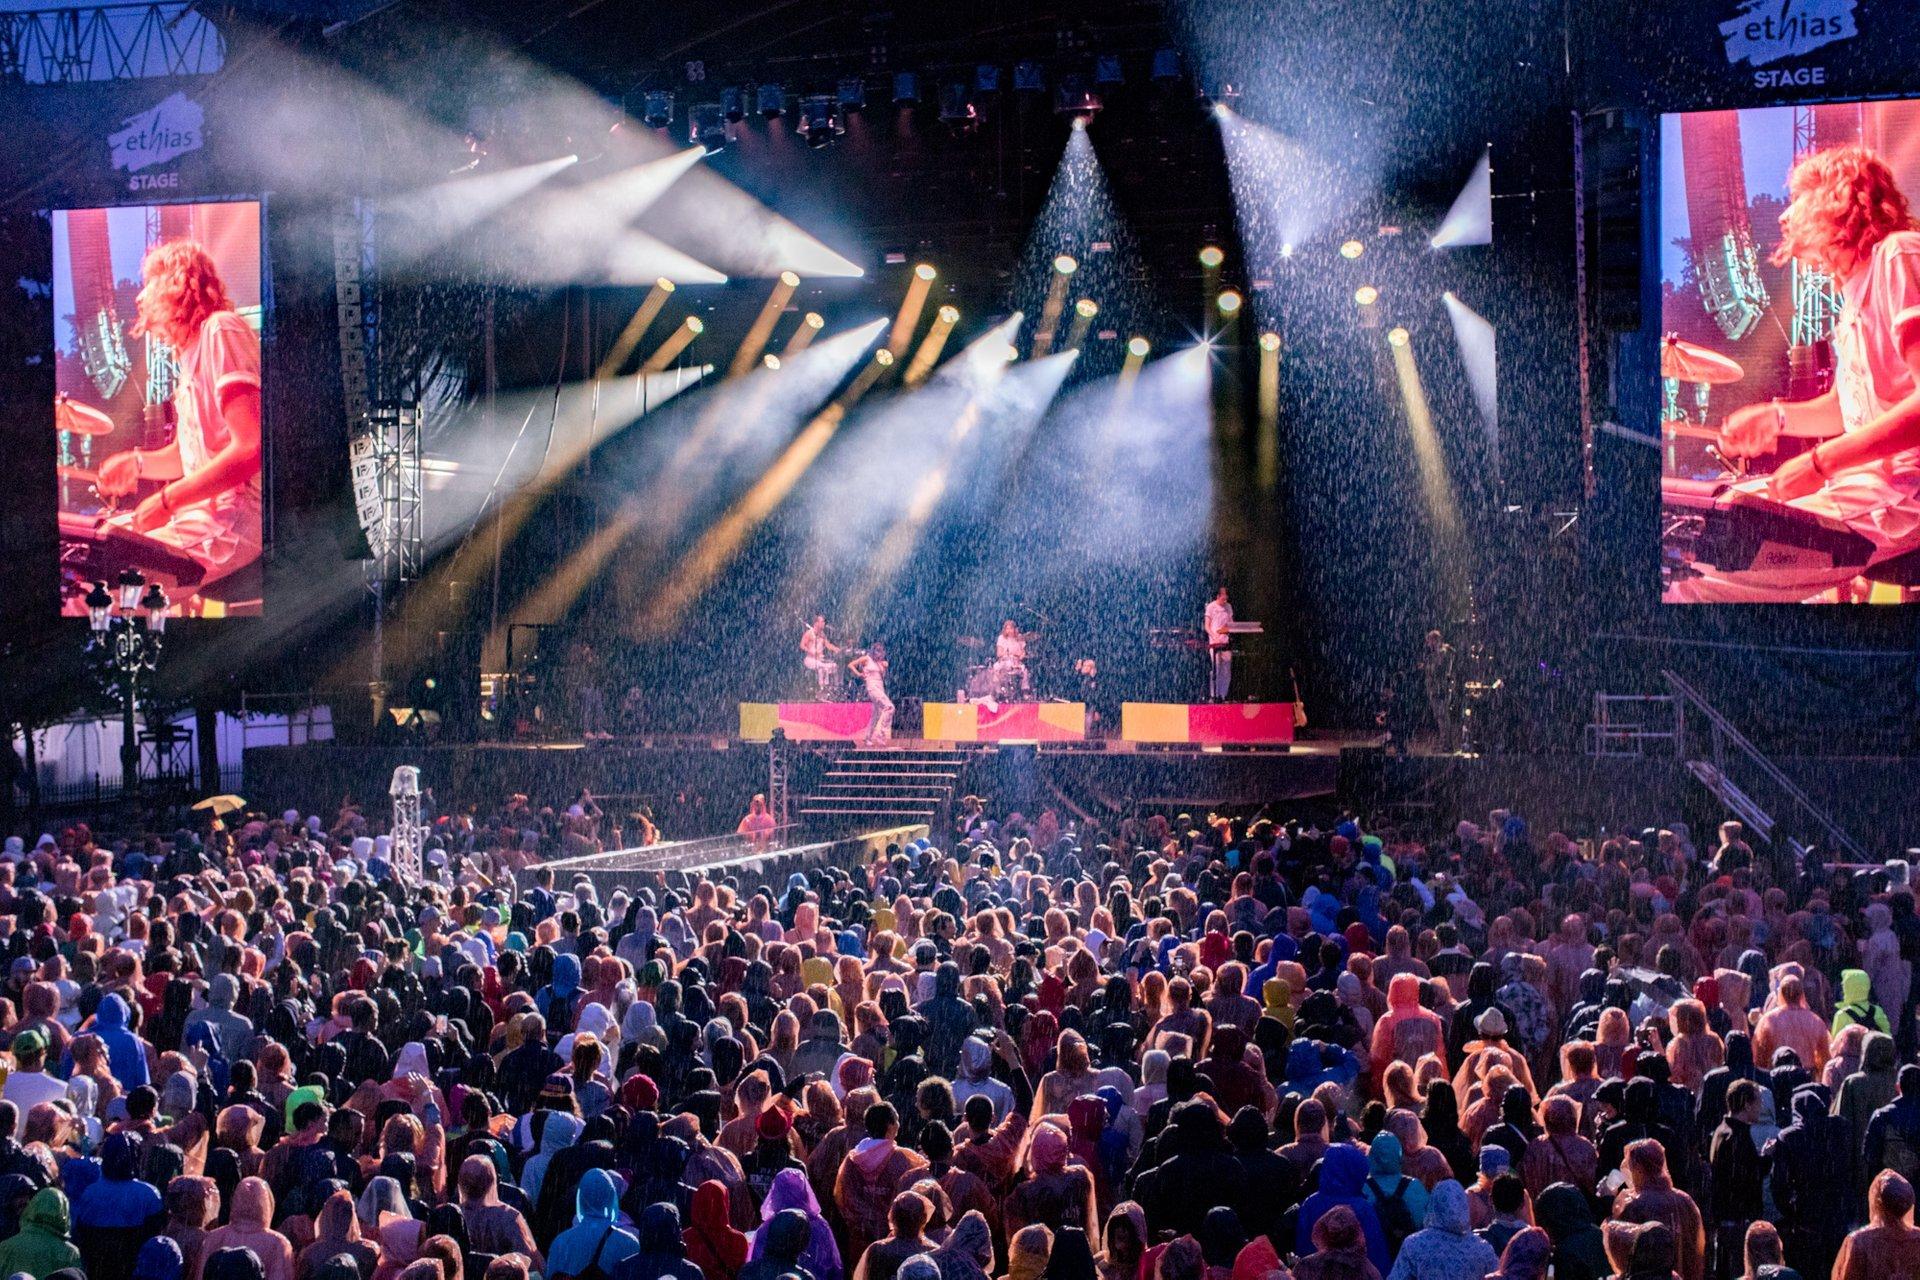 Brussels Summer Festival in Brussels 2020 - Best Time